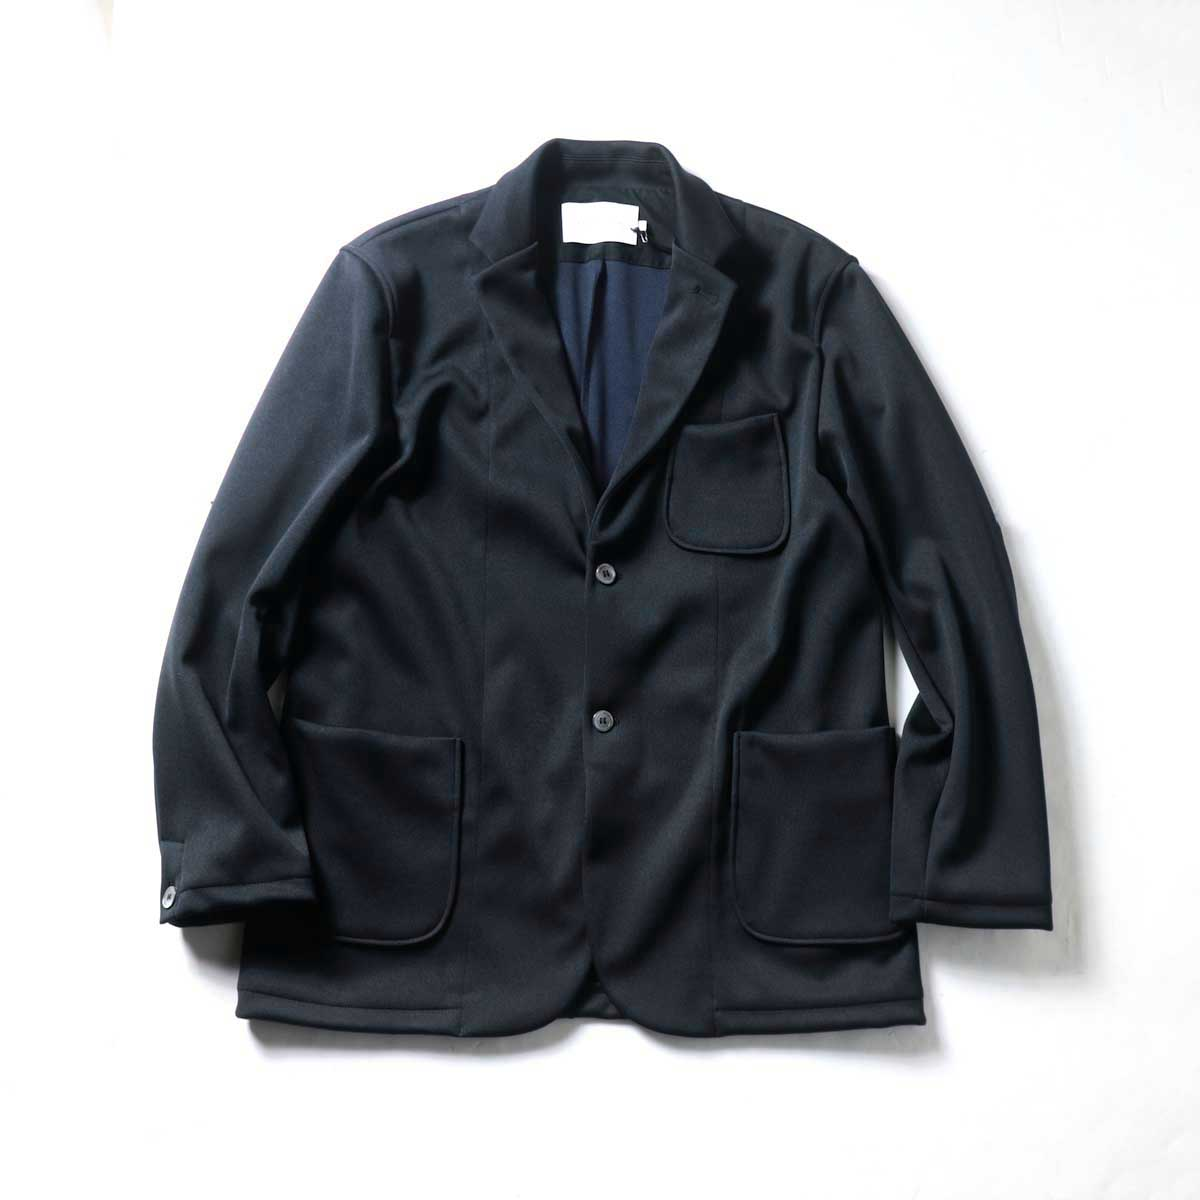 CURLY / TRACK JACKET (Black)